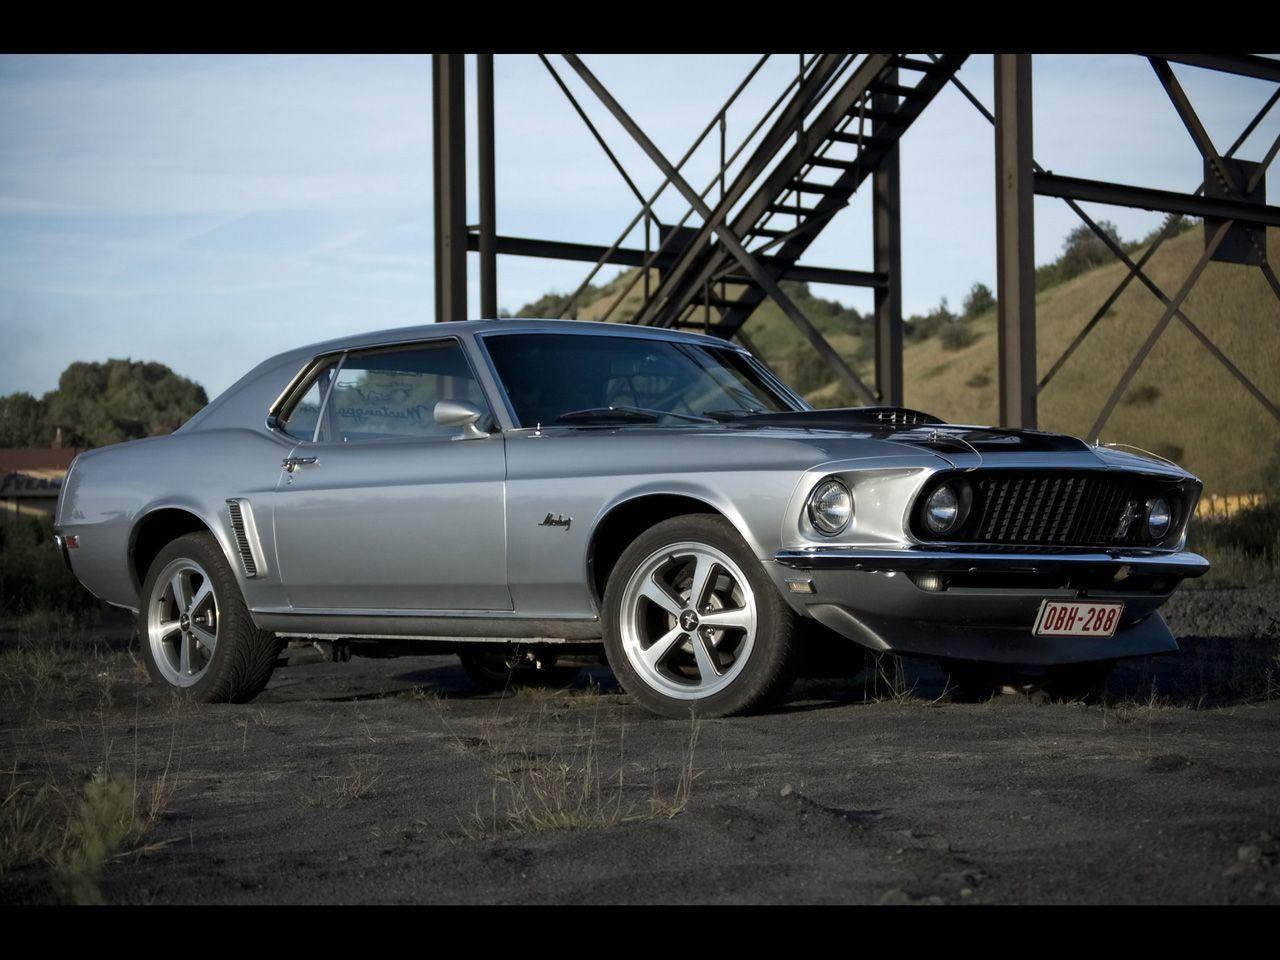 1969 Ford Mustang Hardtop Ford Mustang Forum Ford Mustang Mustang